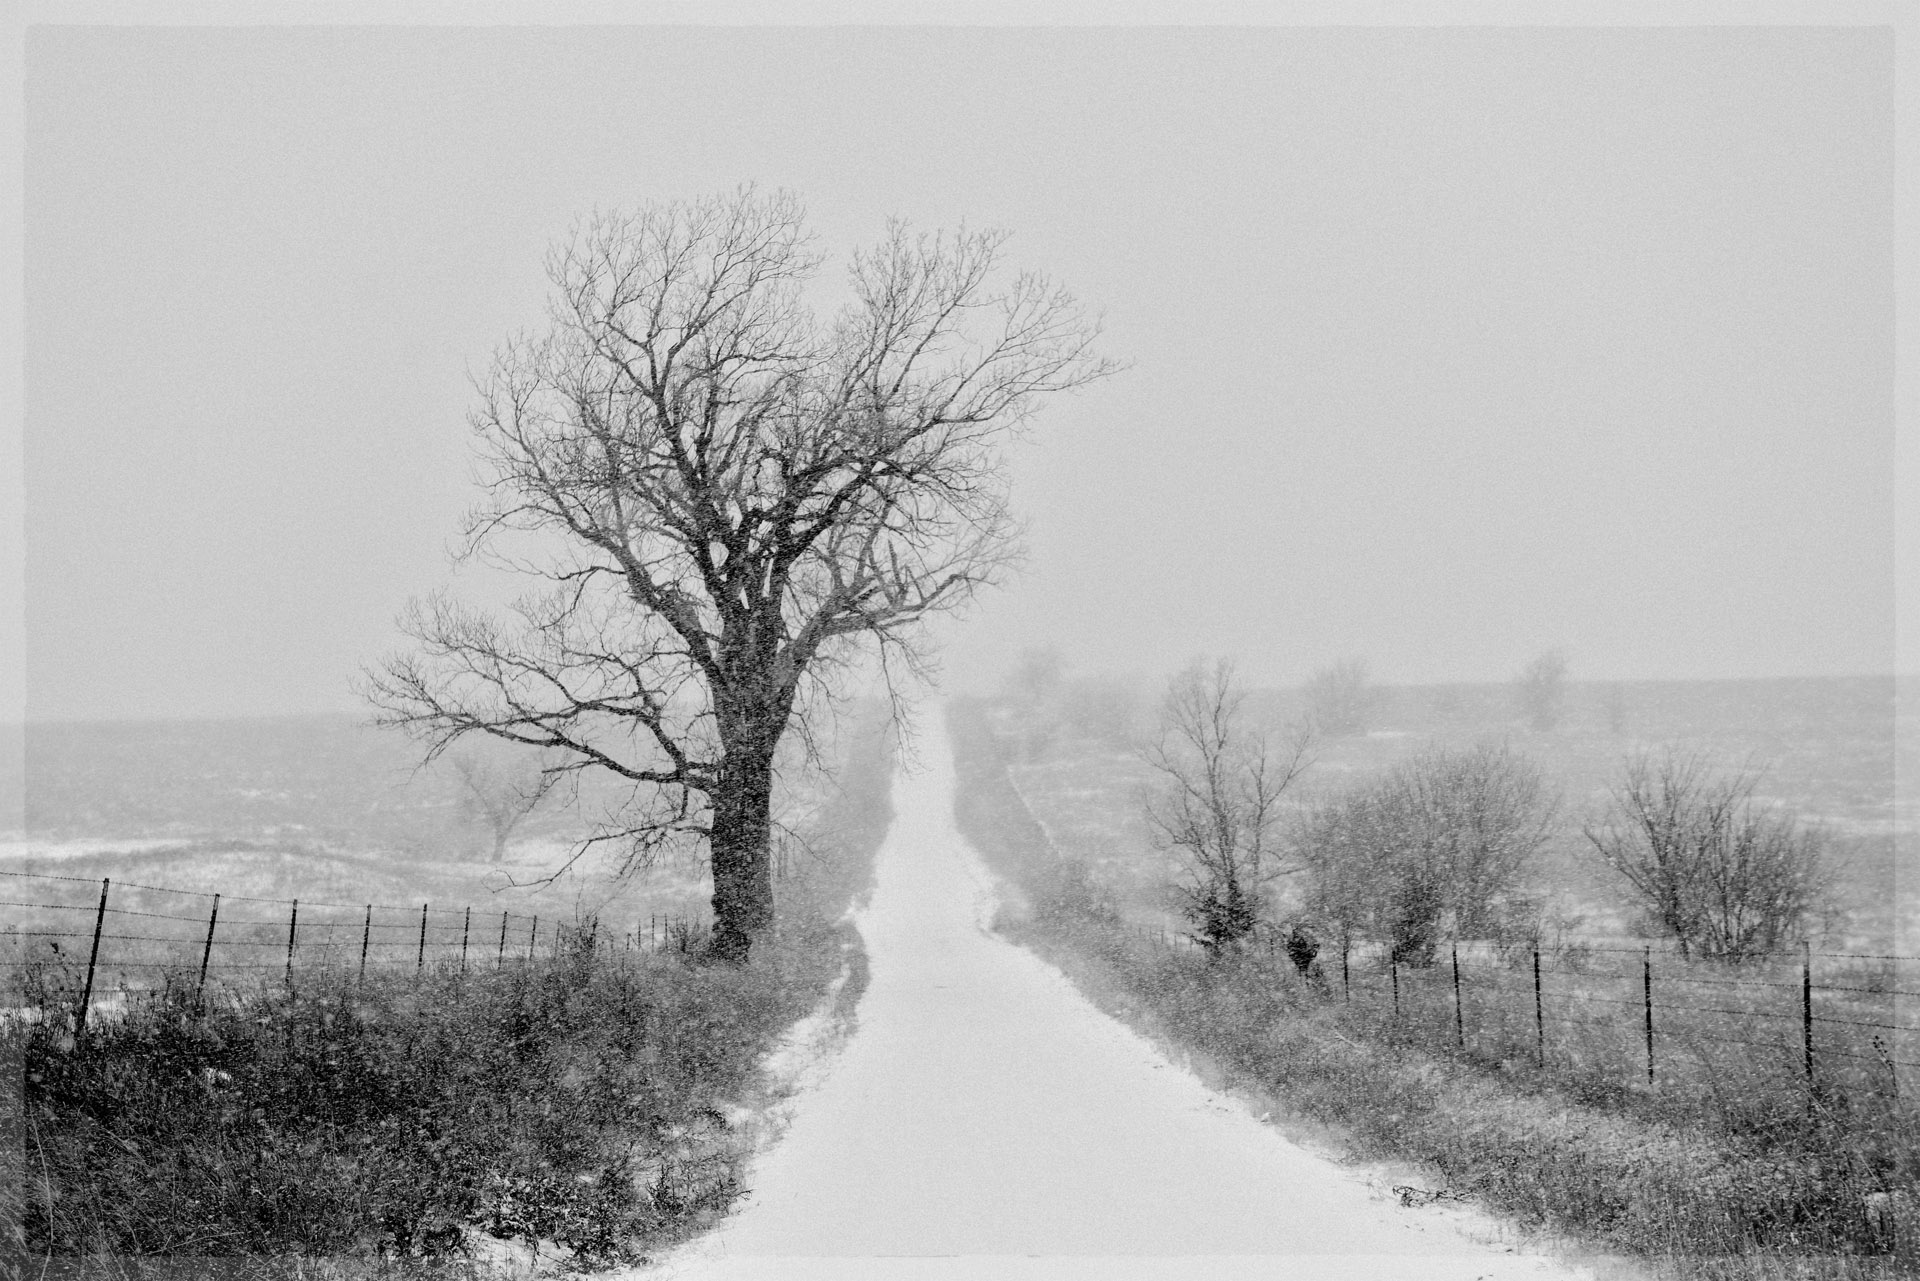 Road 90 in Winter